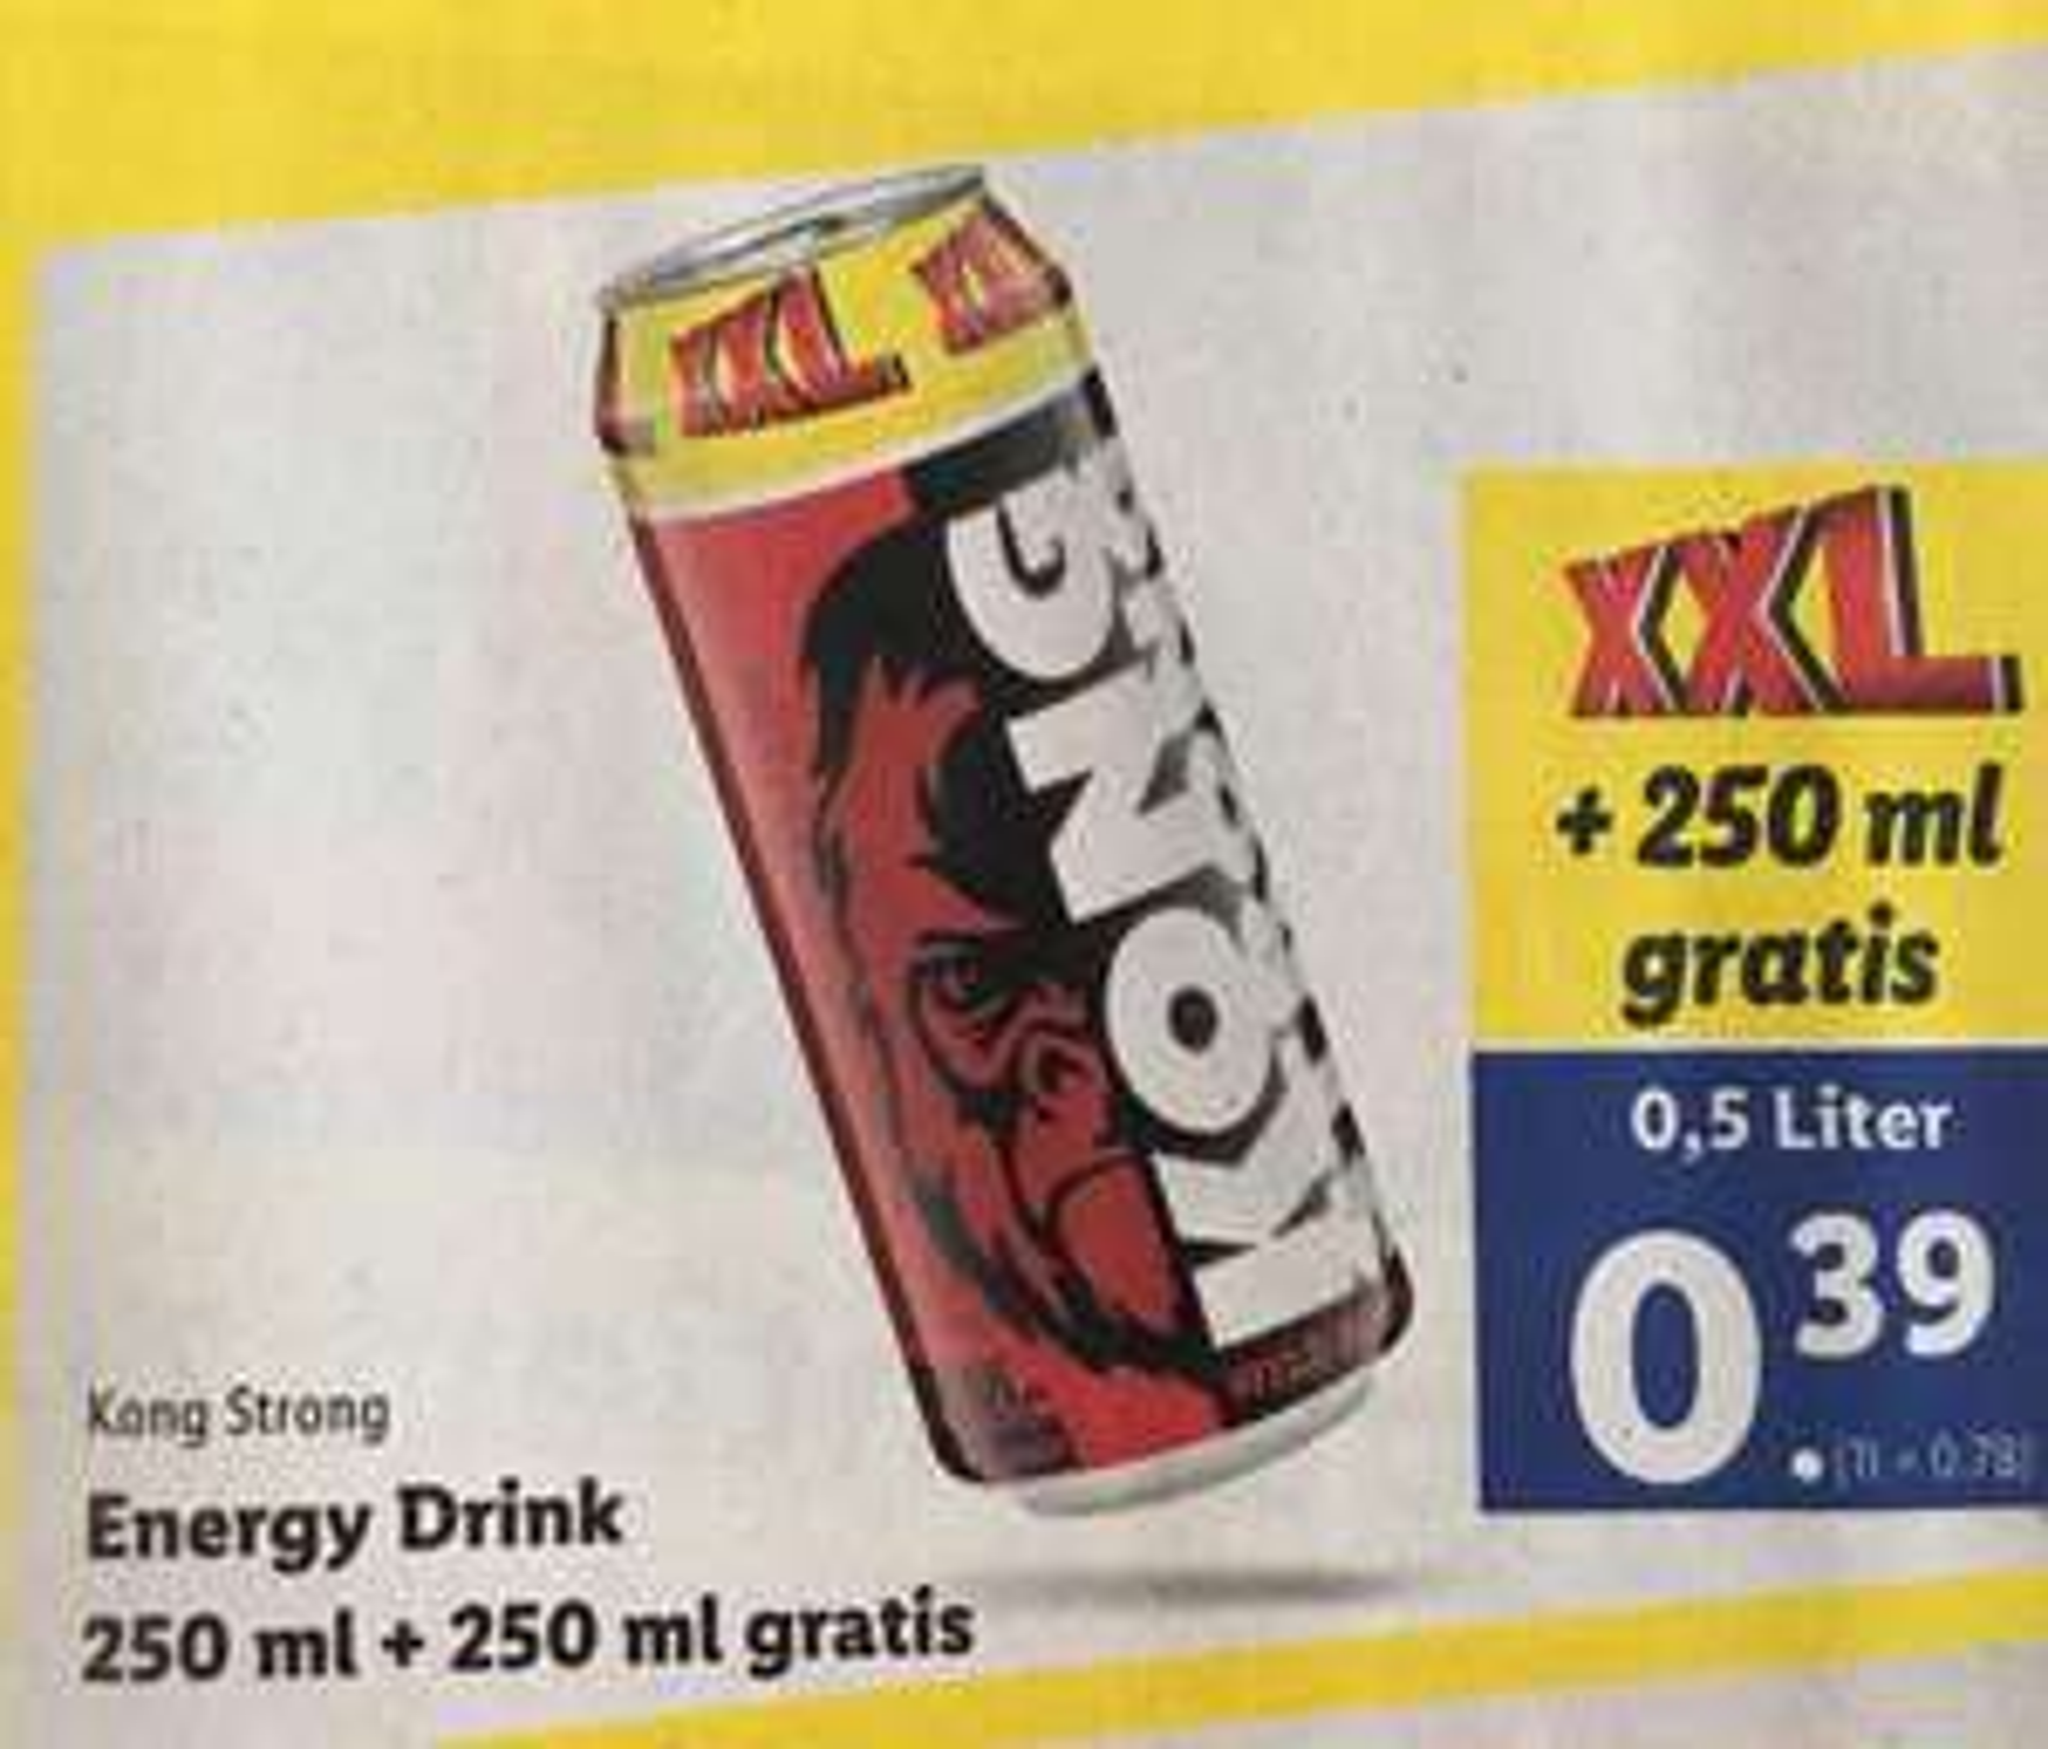 [Lidl] Kong Strong Energy / 0,5 Liter für 0,39 Euro